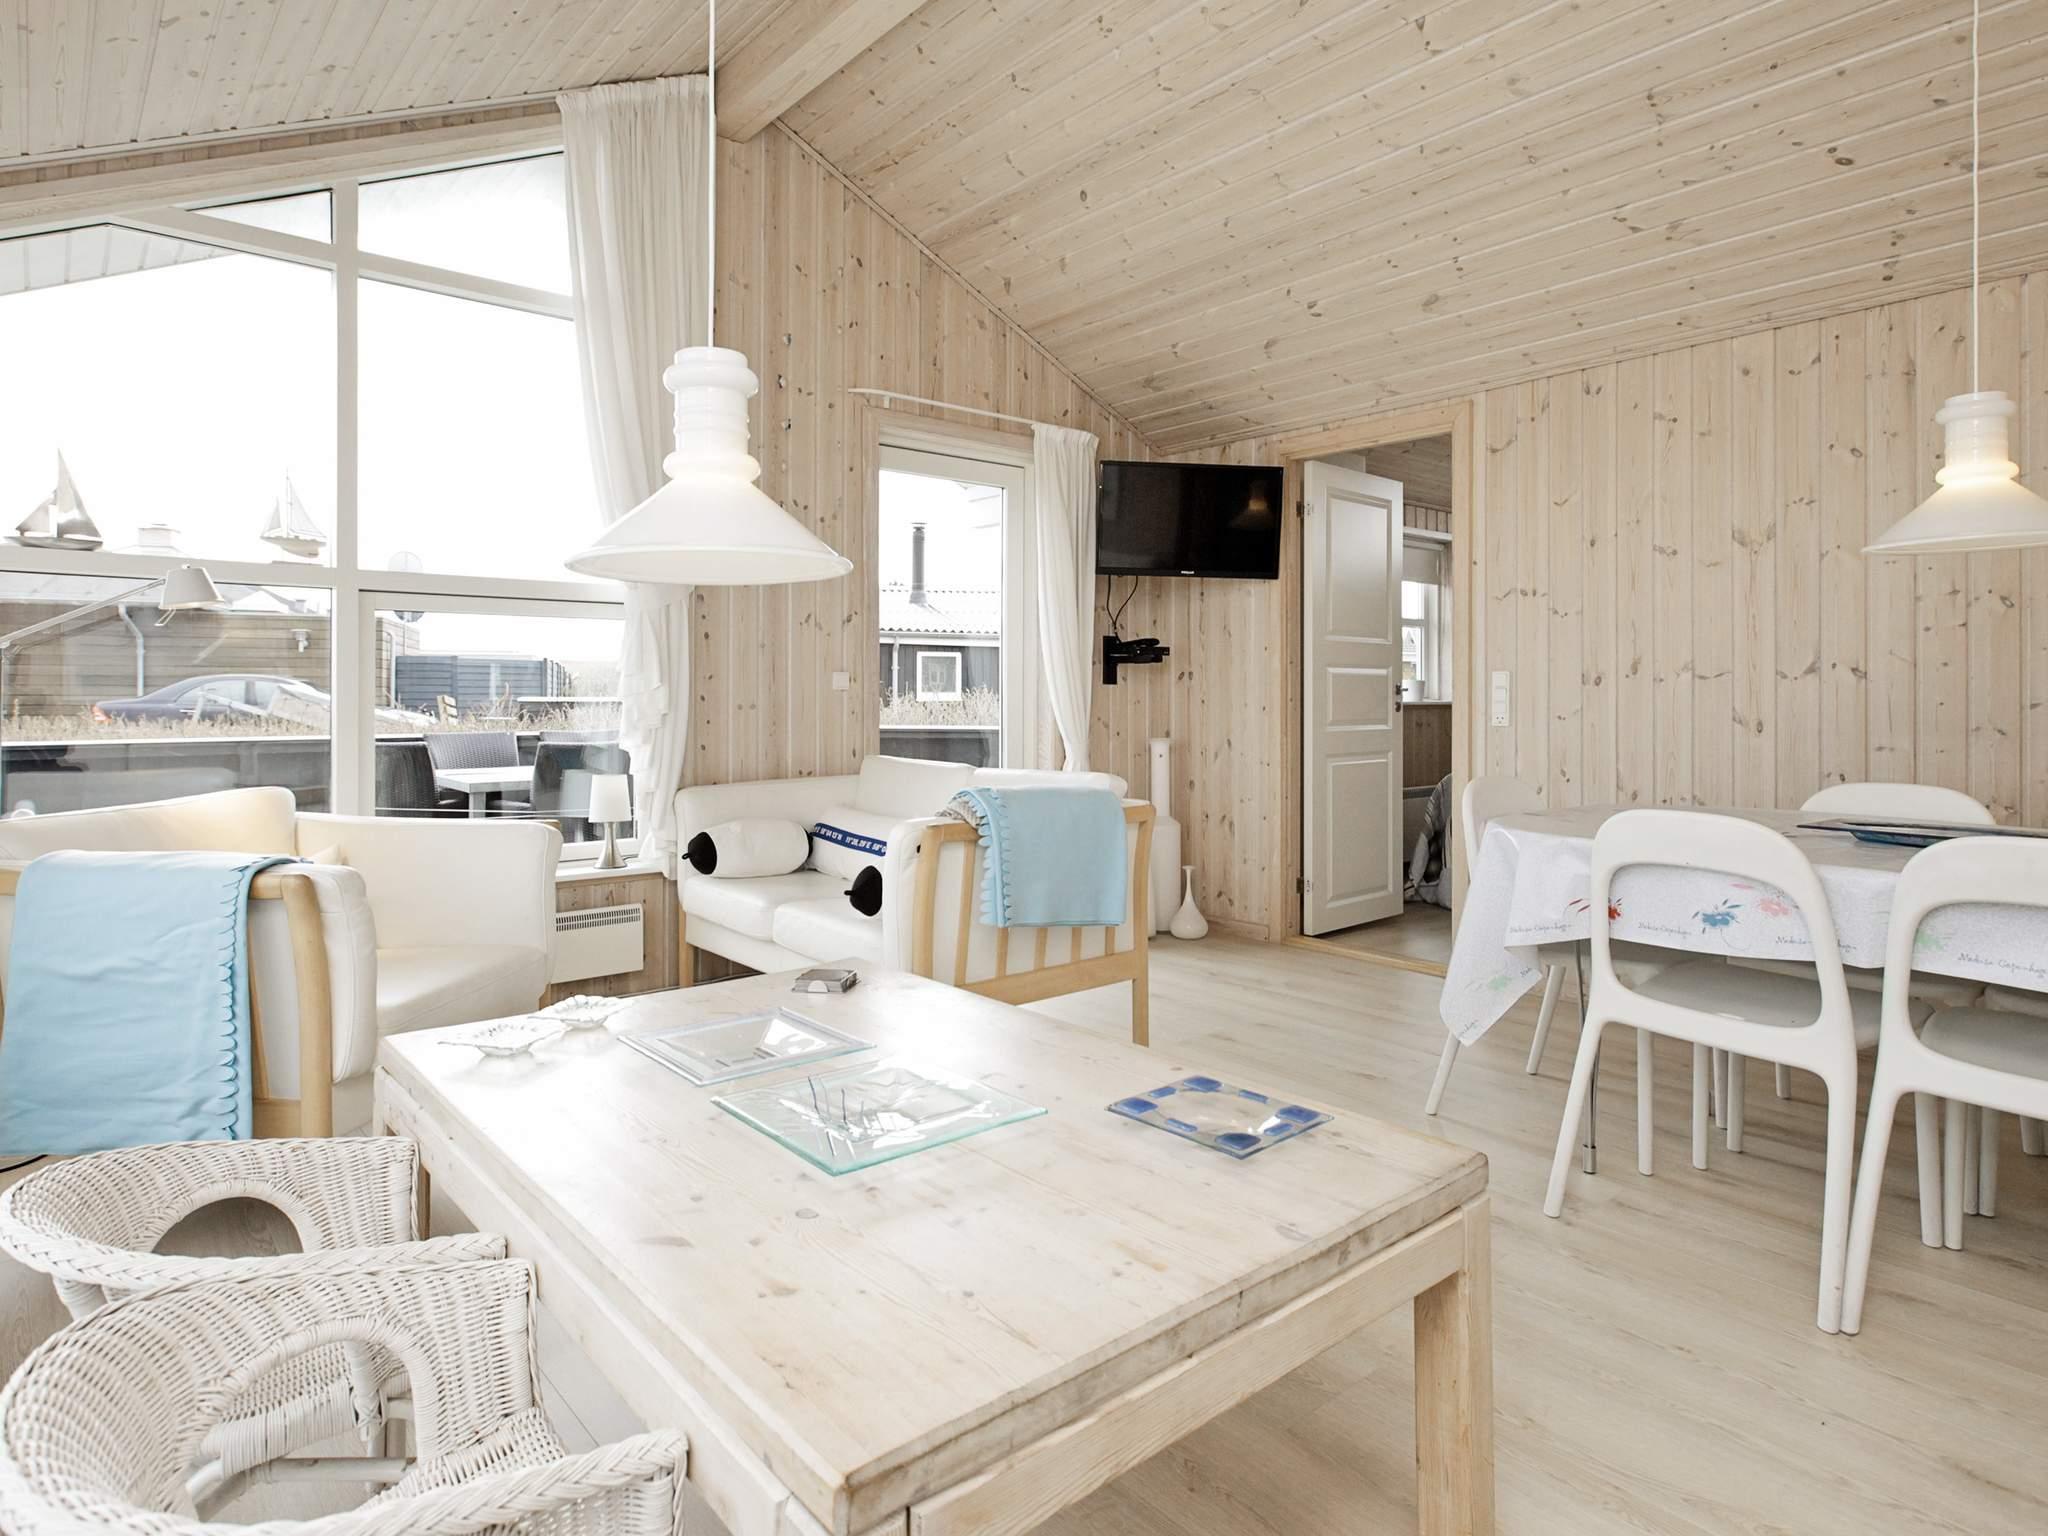 Ferienhaus Sæby/Sulbæk (83969), Sæby, , Nordostjütland, Dänemark, Bild 6